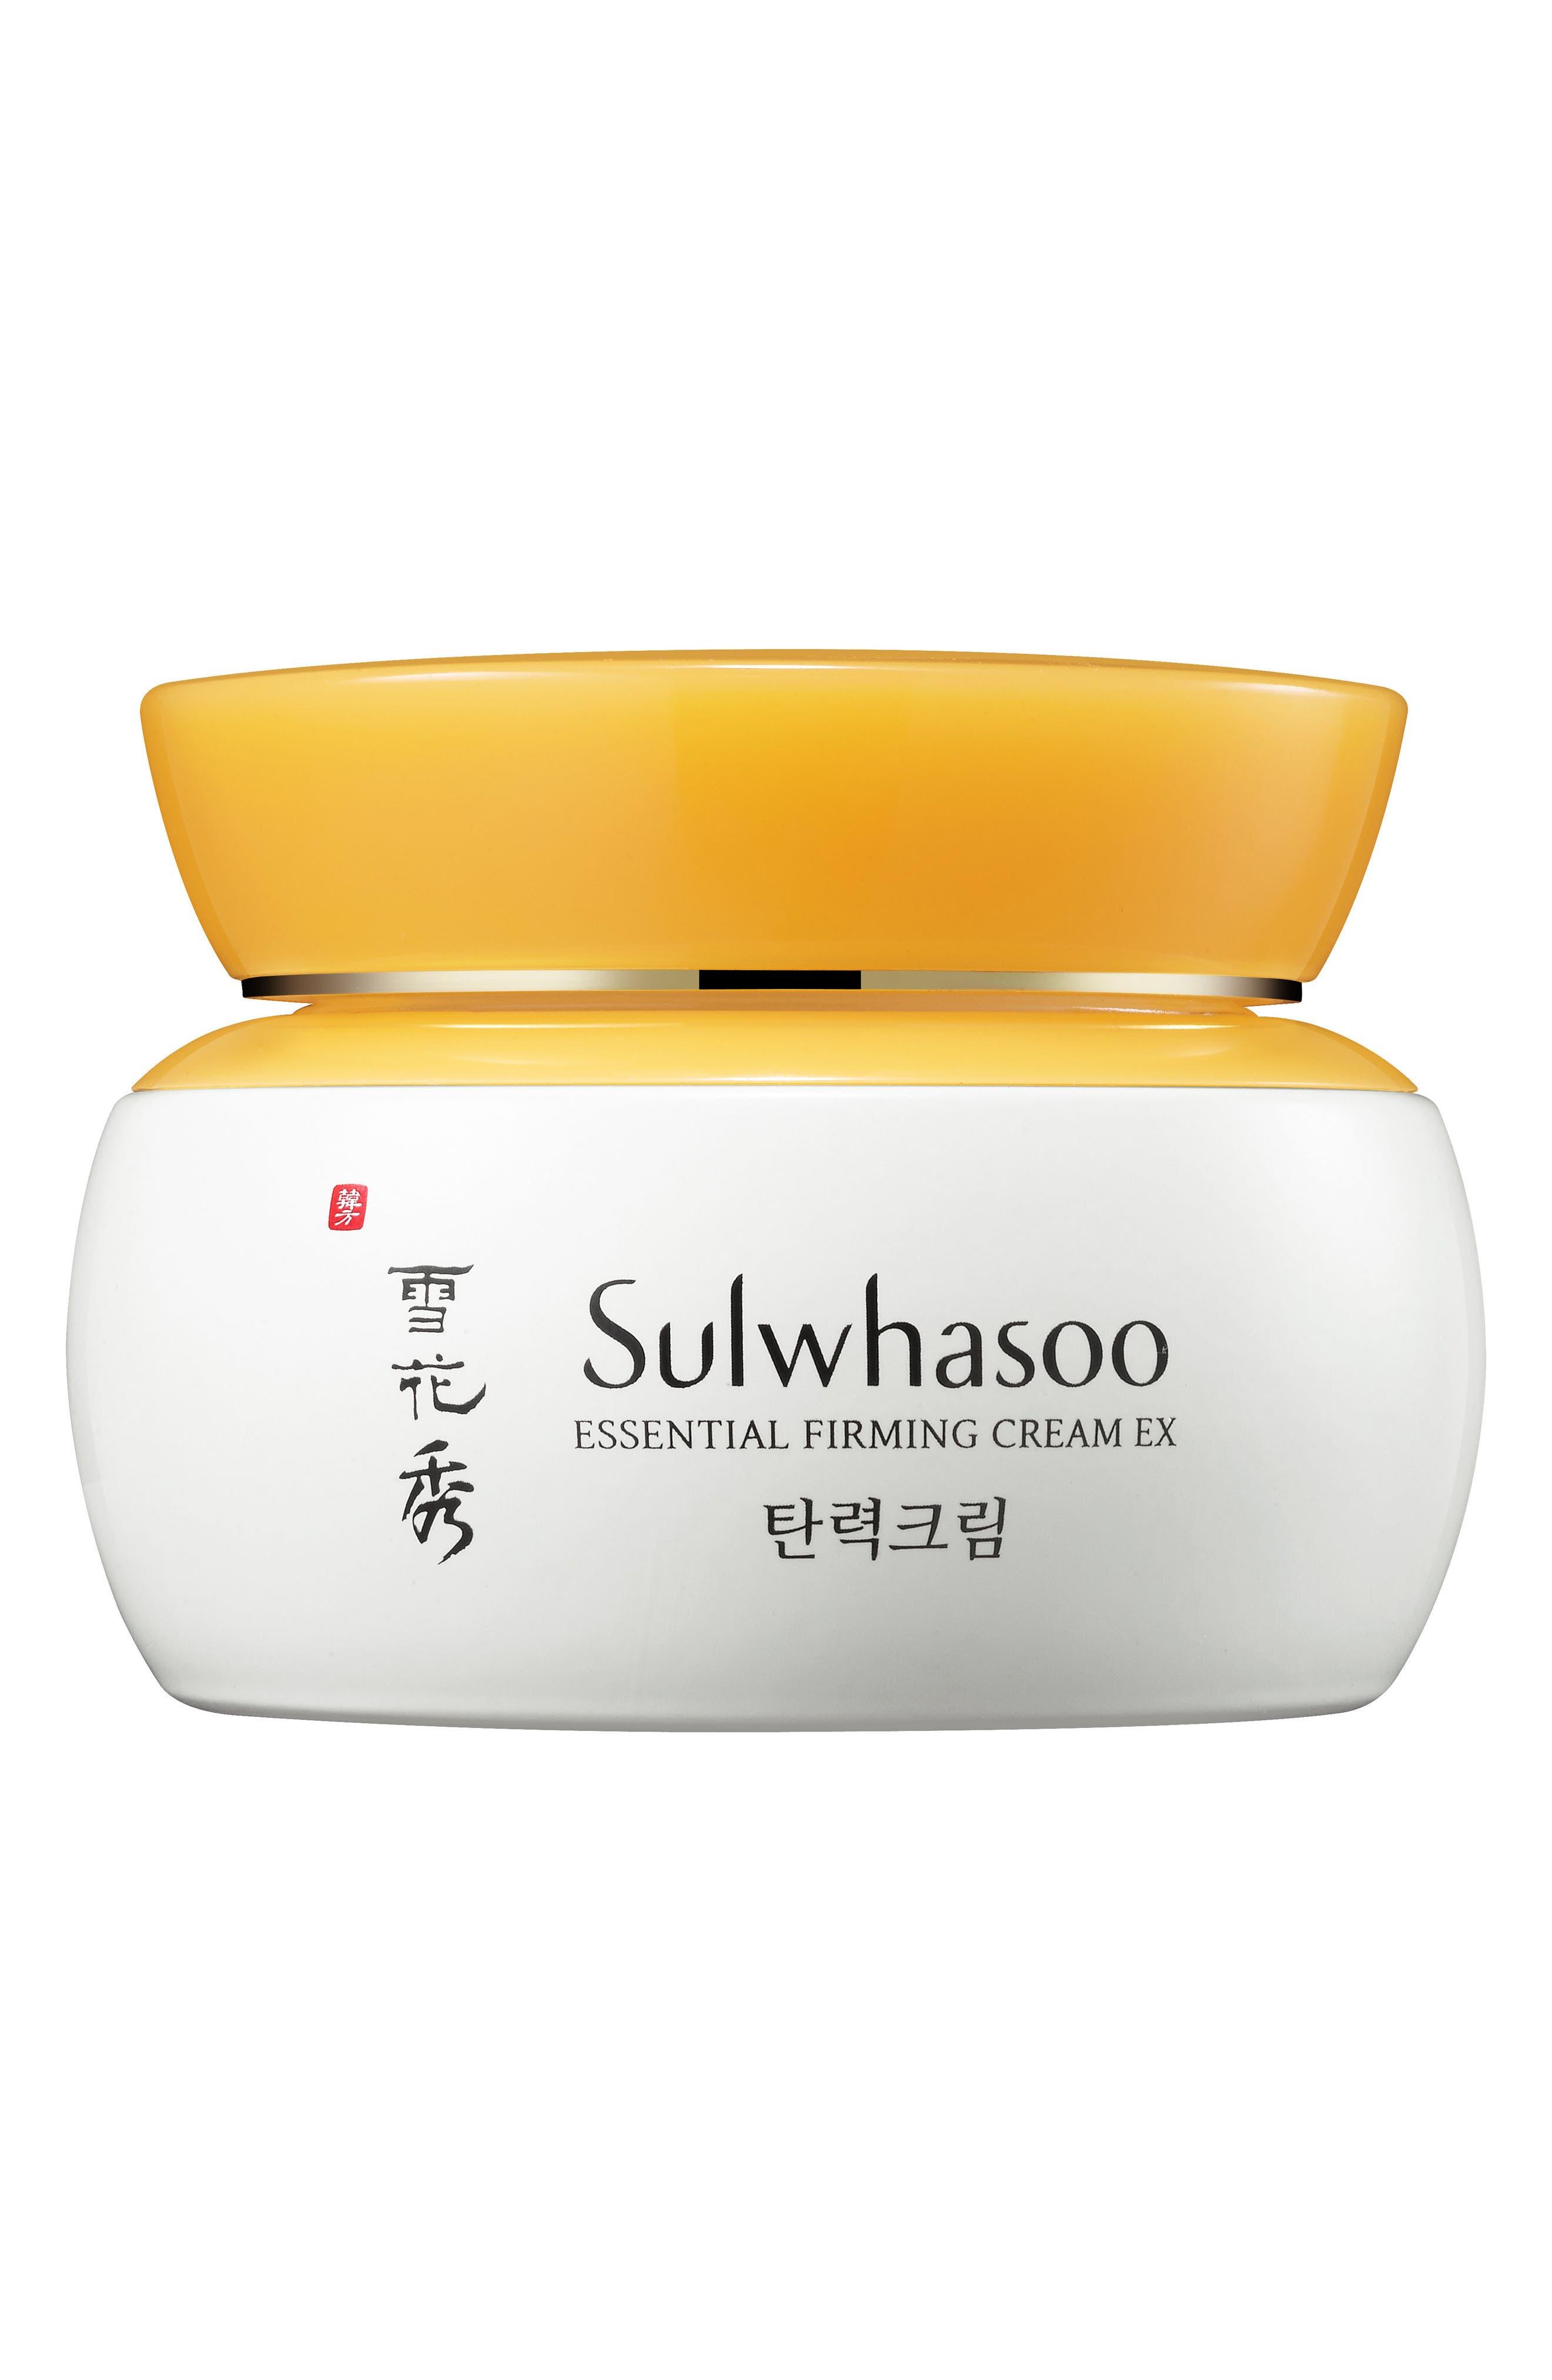 Alternate Image 1 Selected - Sulwhasoo Essential Firming Cream EX